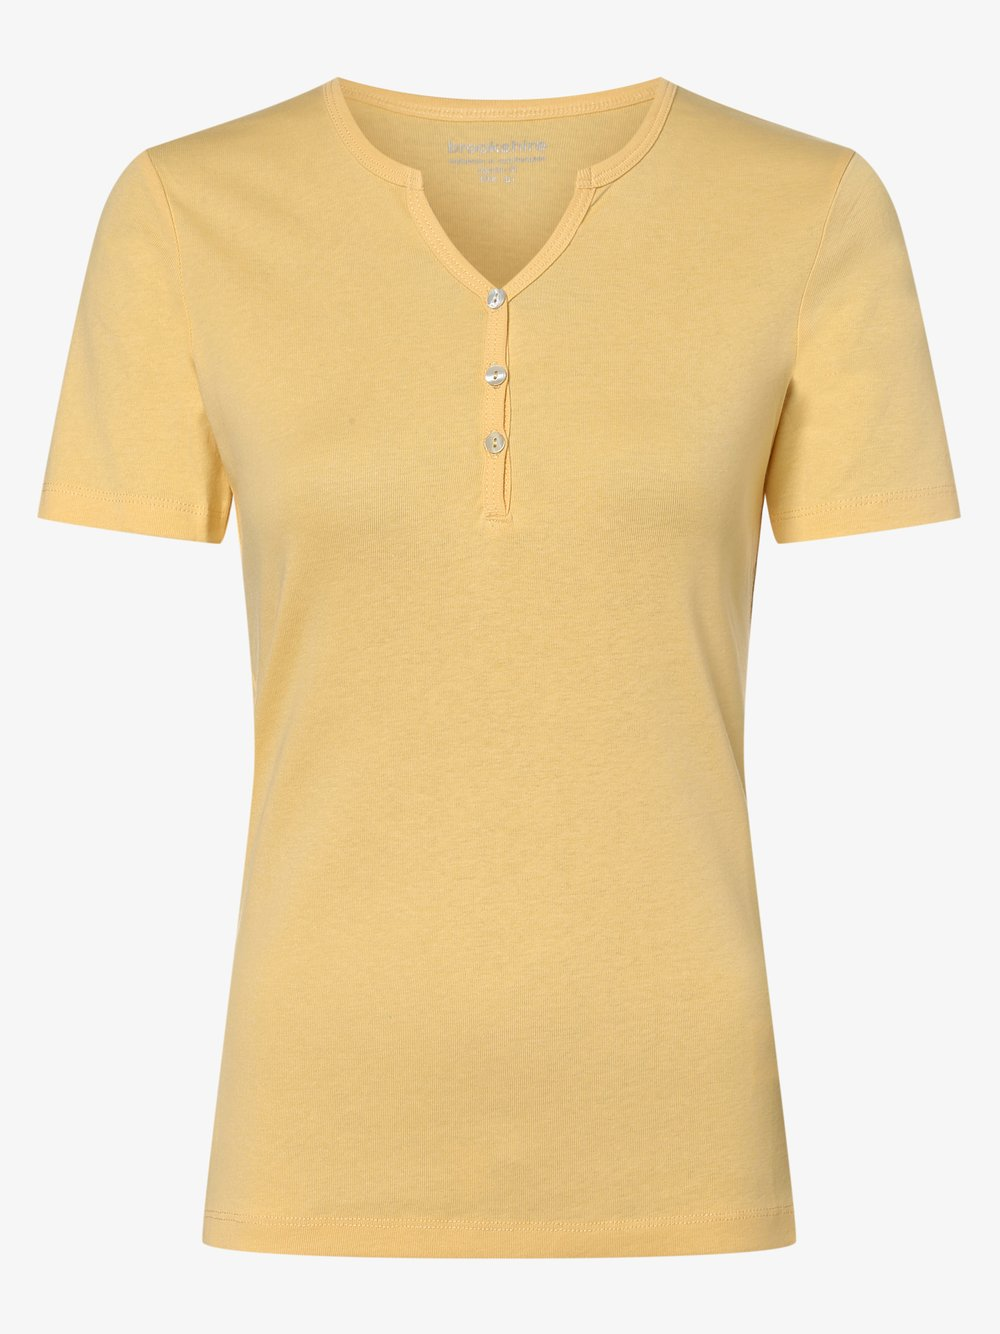 brookshire - T-shirt damski, żółty